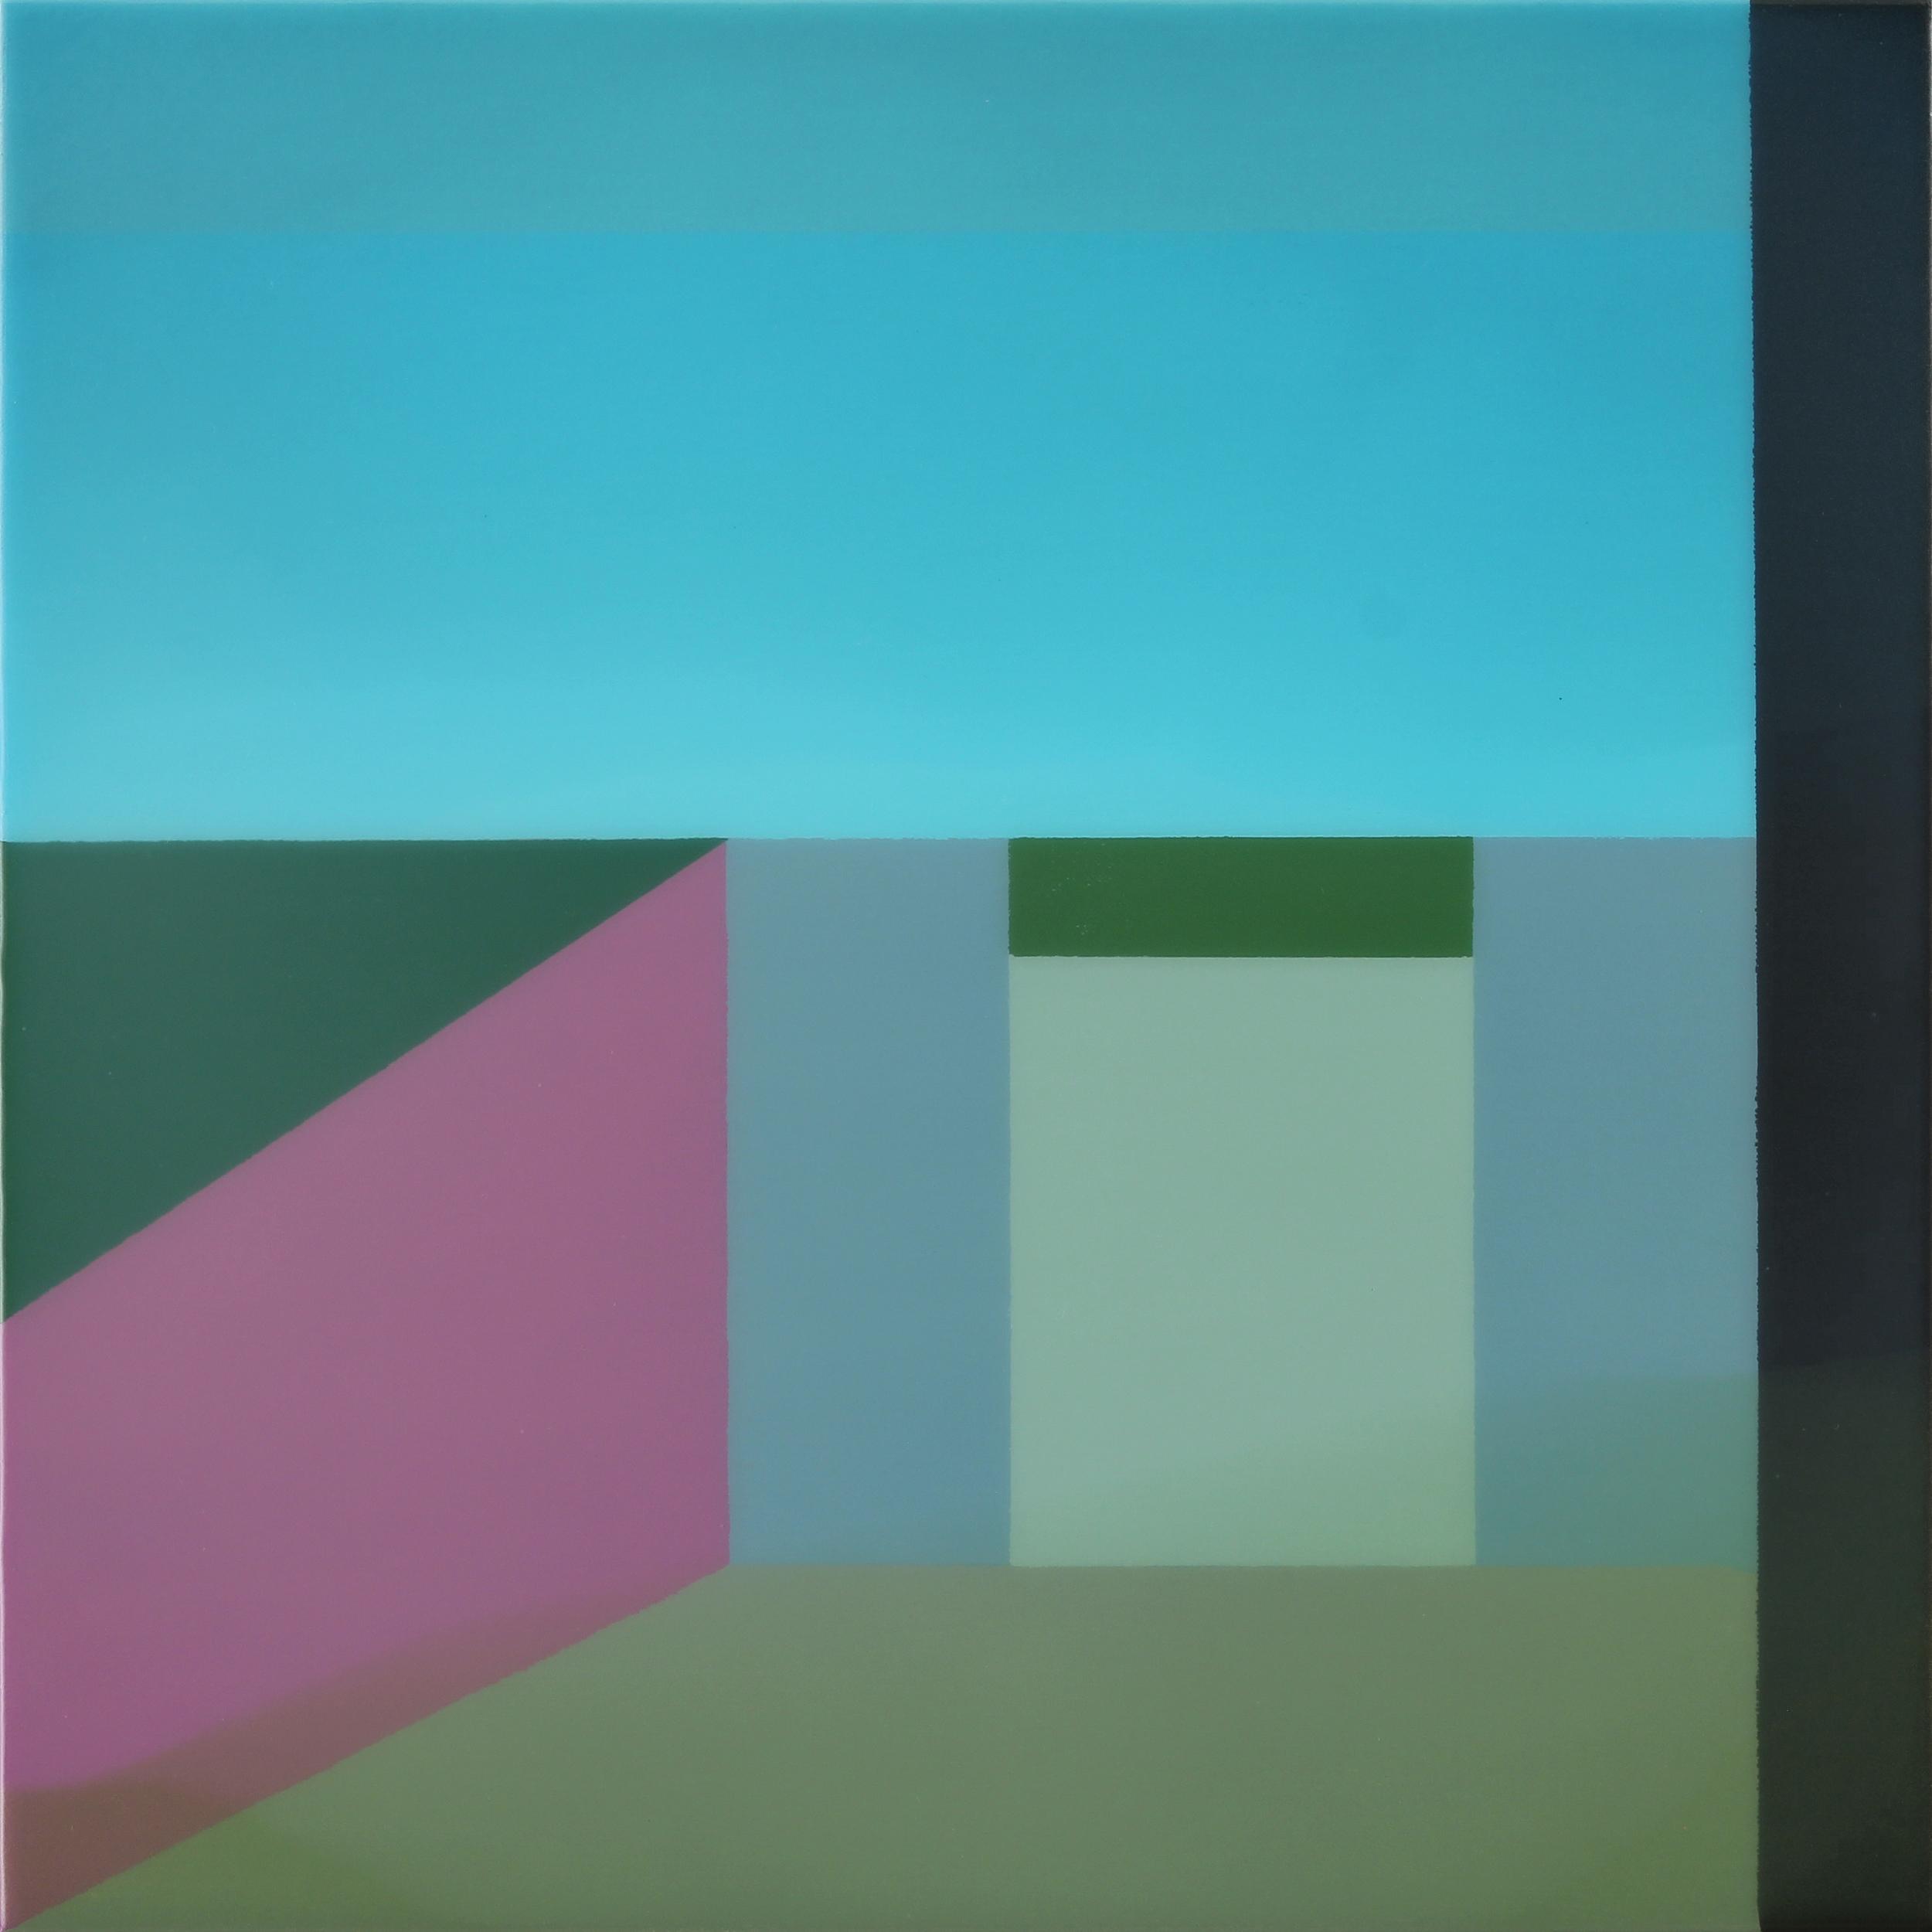 """Level 3"", Acrylic on canvas over panel, 16"" X 16"", 2015."